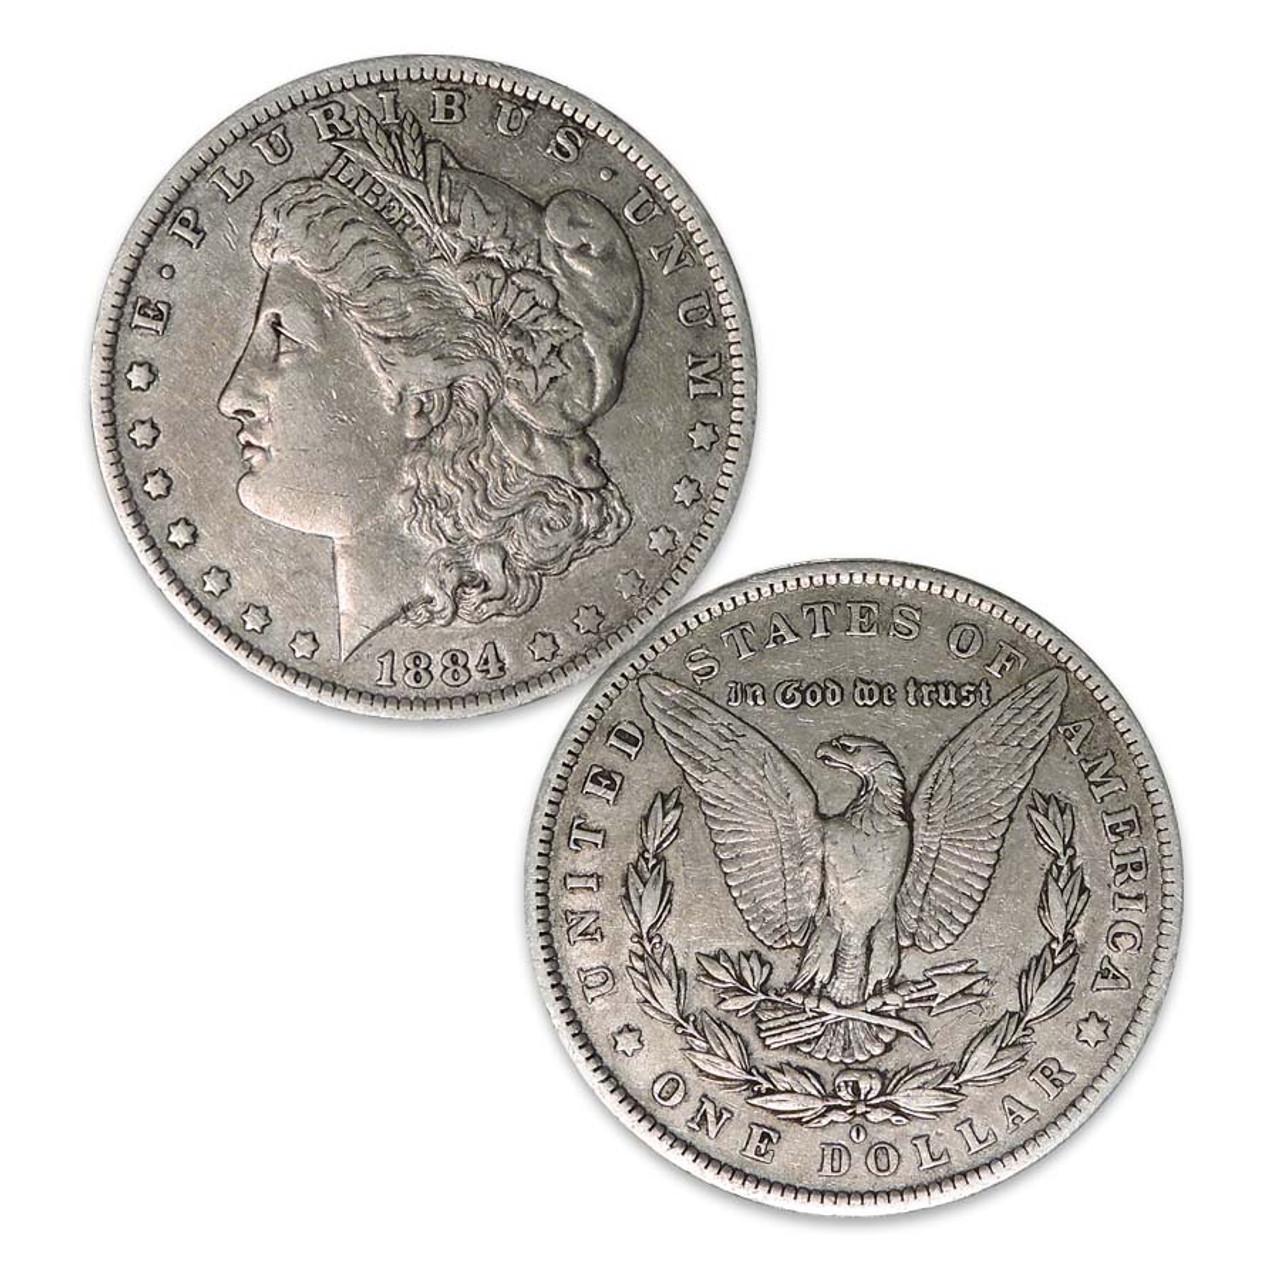 1884-O Morgan Silver Dollar Very Fine Image 1